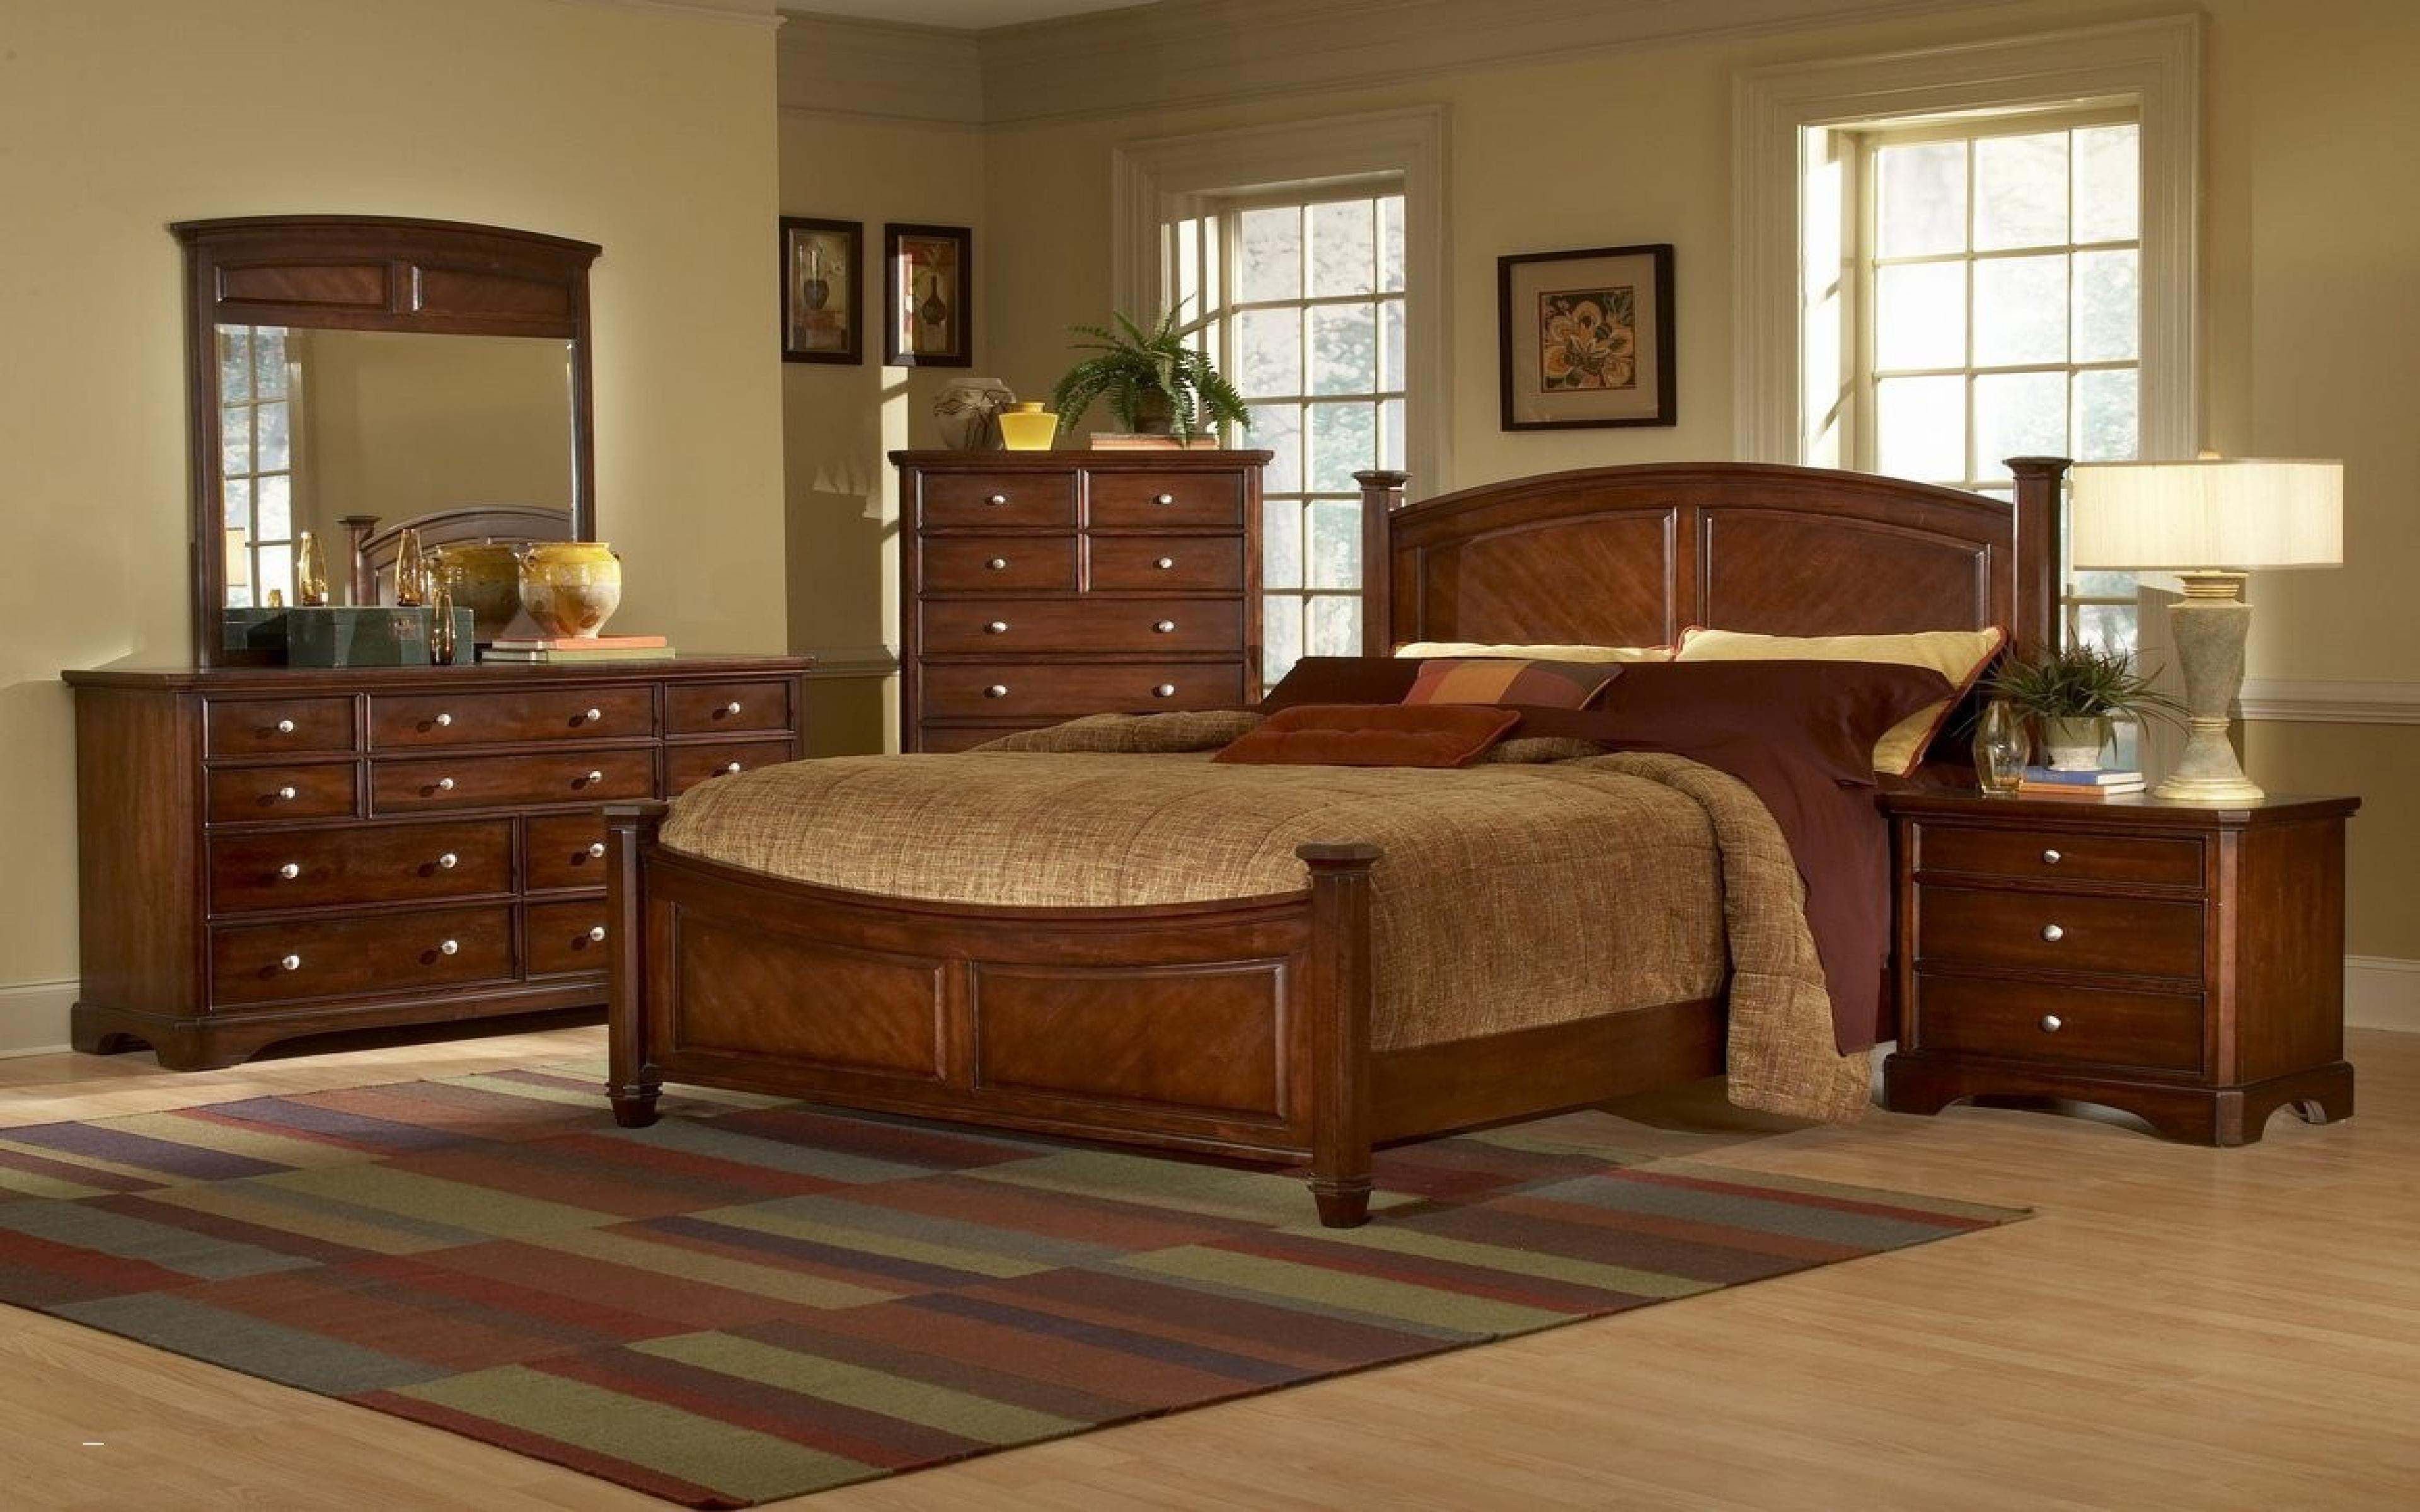 30 Schöne Holz Möbel Sofa Schlafzimmer set, Holz